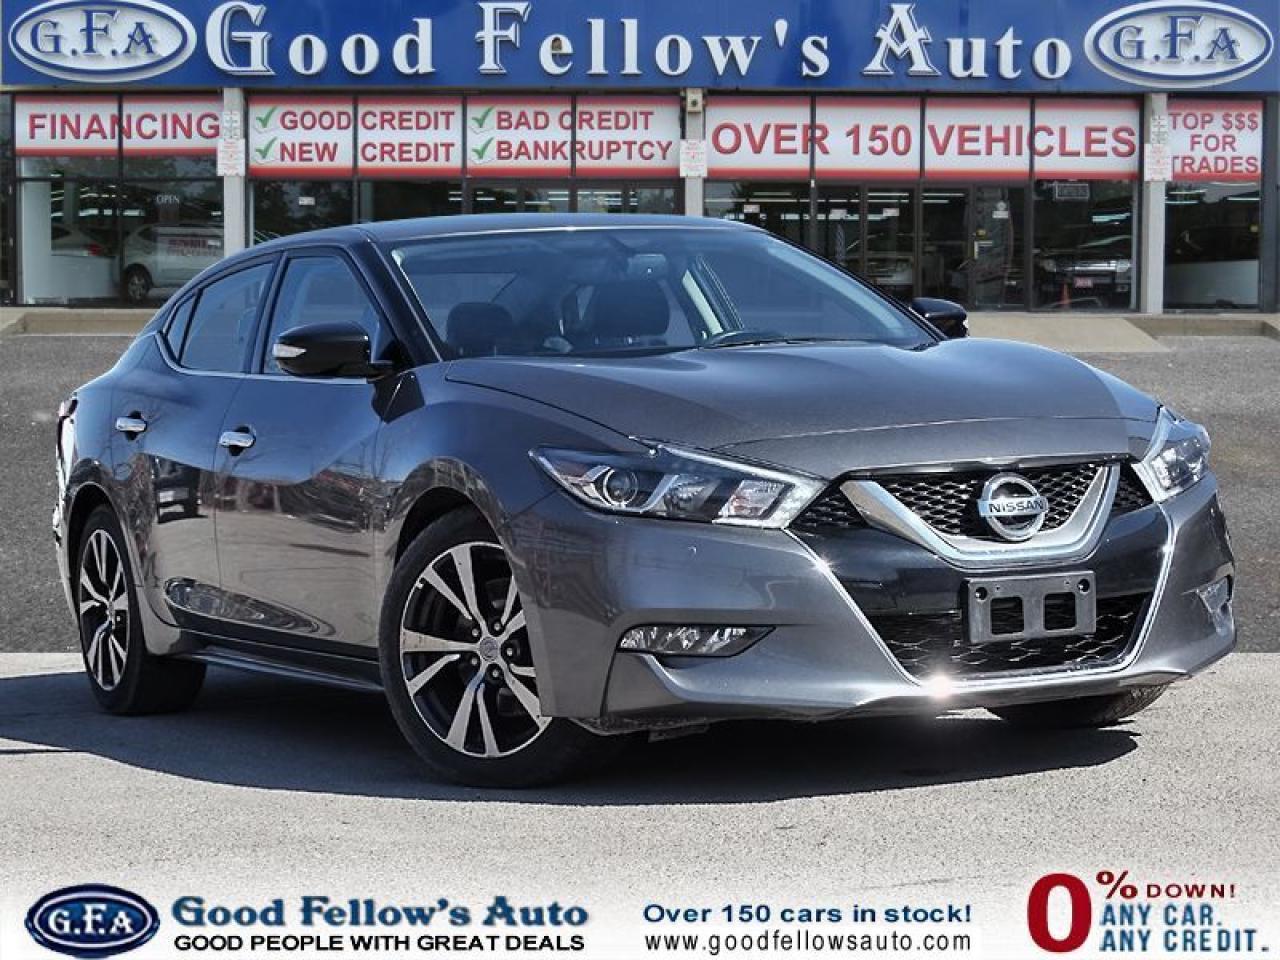 2017 Nissan Maxima SV MODEL, LEATHER SEATS, NAVI, REARVIEW CAMERA